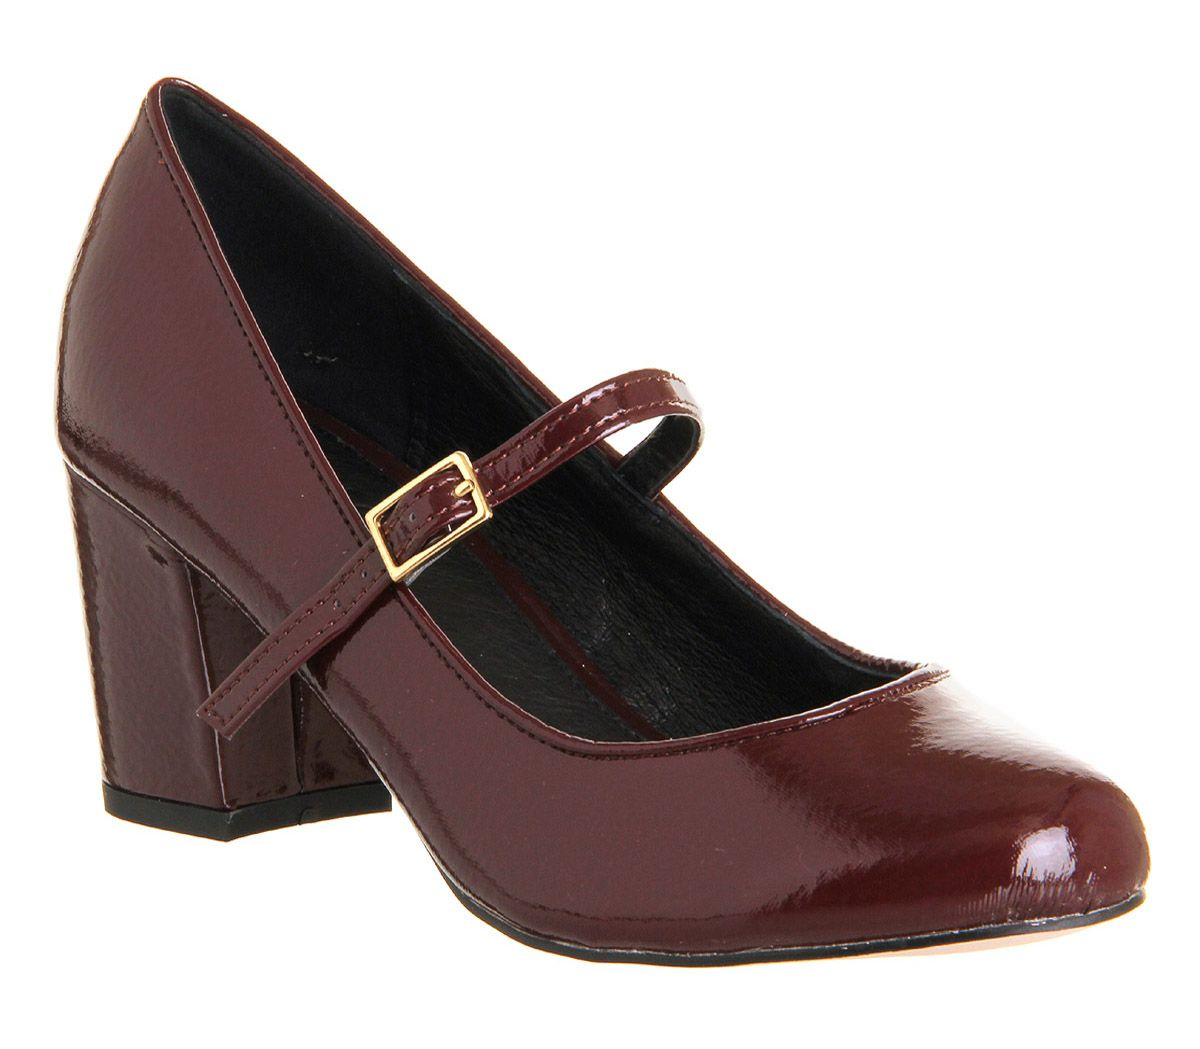 Office Gatsby Mid Heel Burgundy Patent - Mid Heels